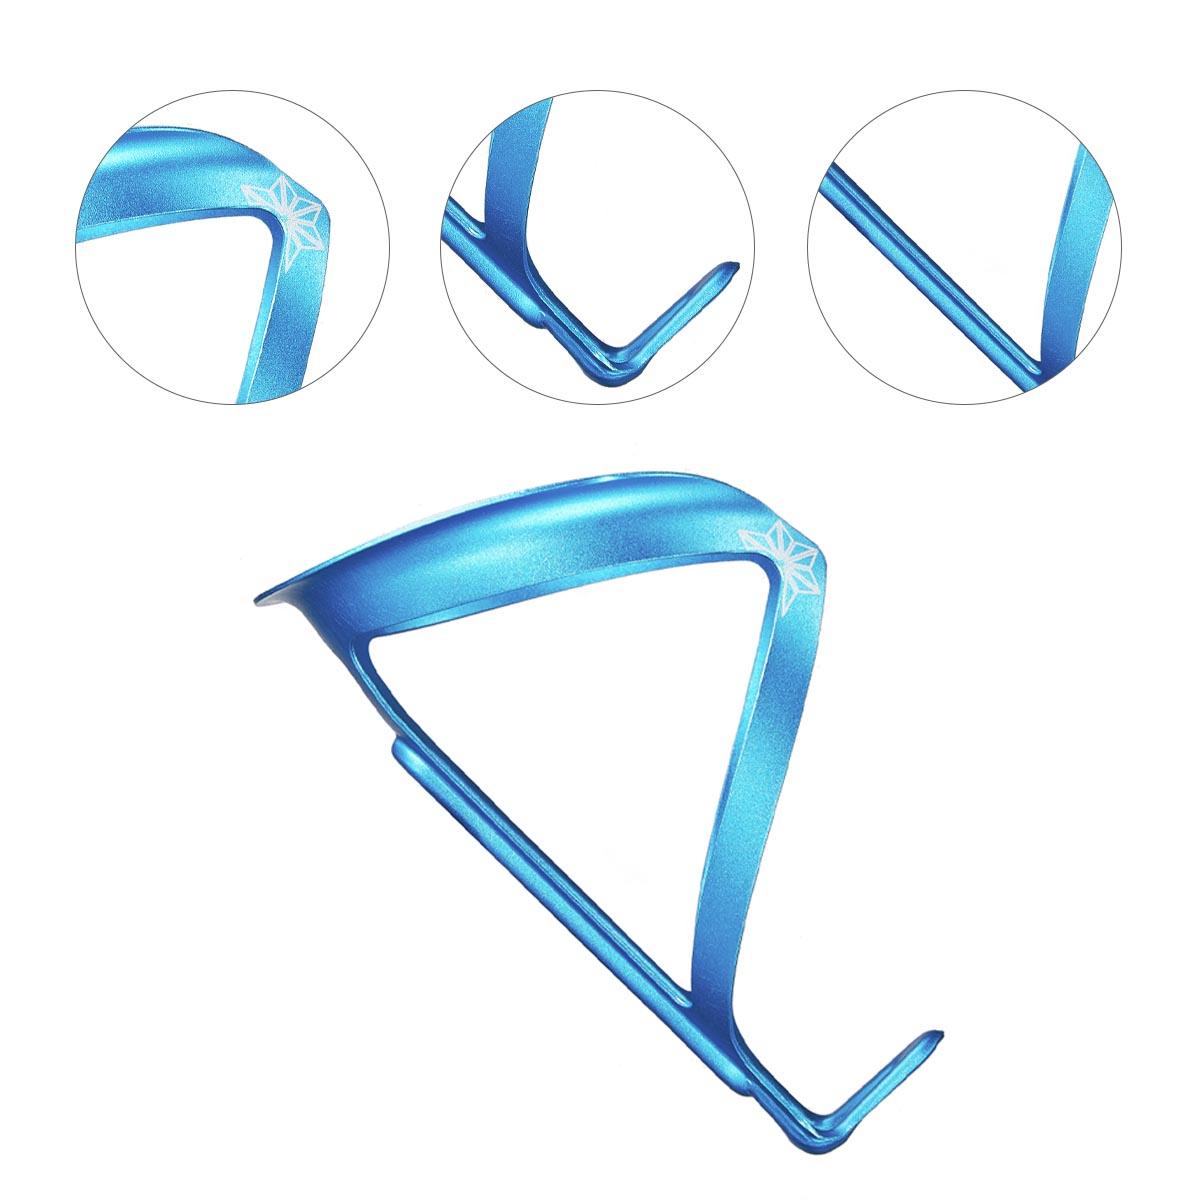 Suporte Caramanhola Supacaz FlyCage Ano Aluminio Azul